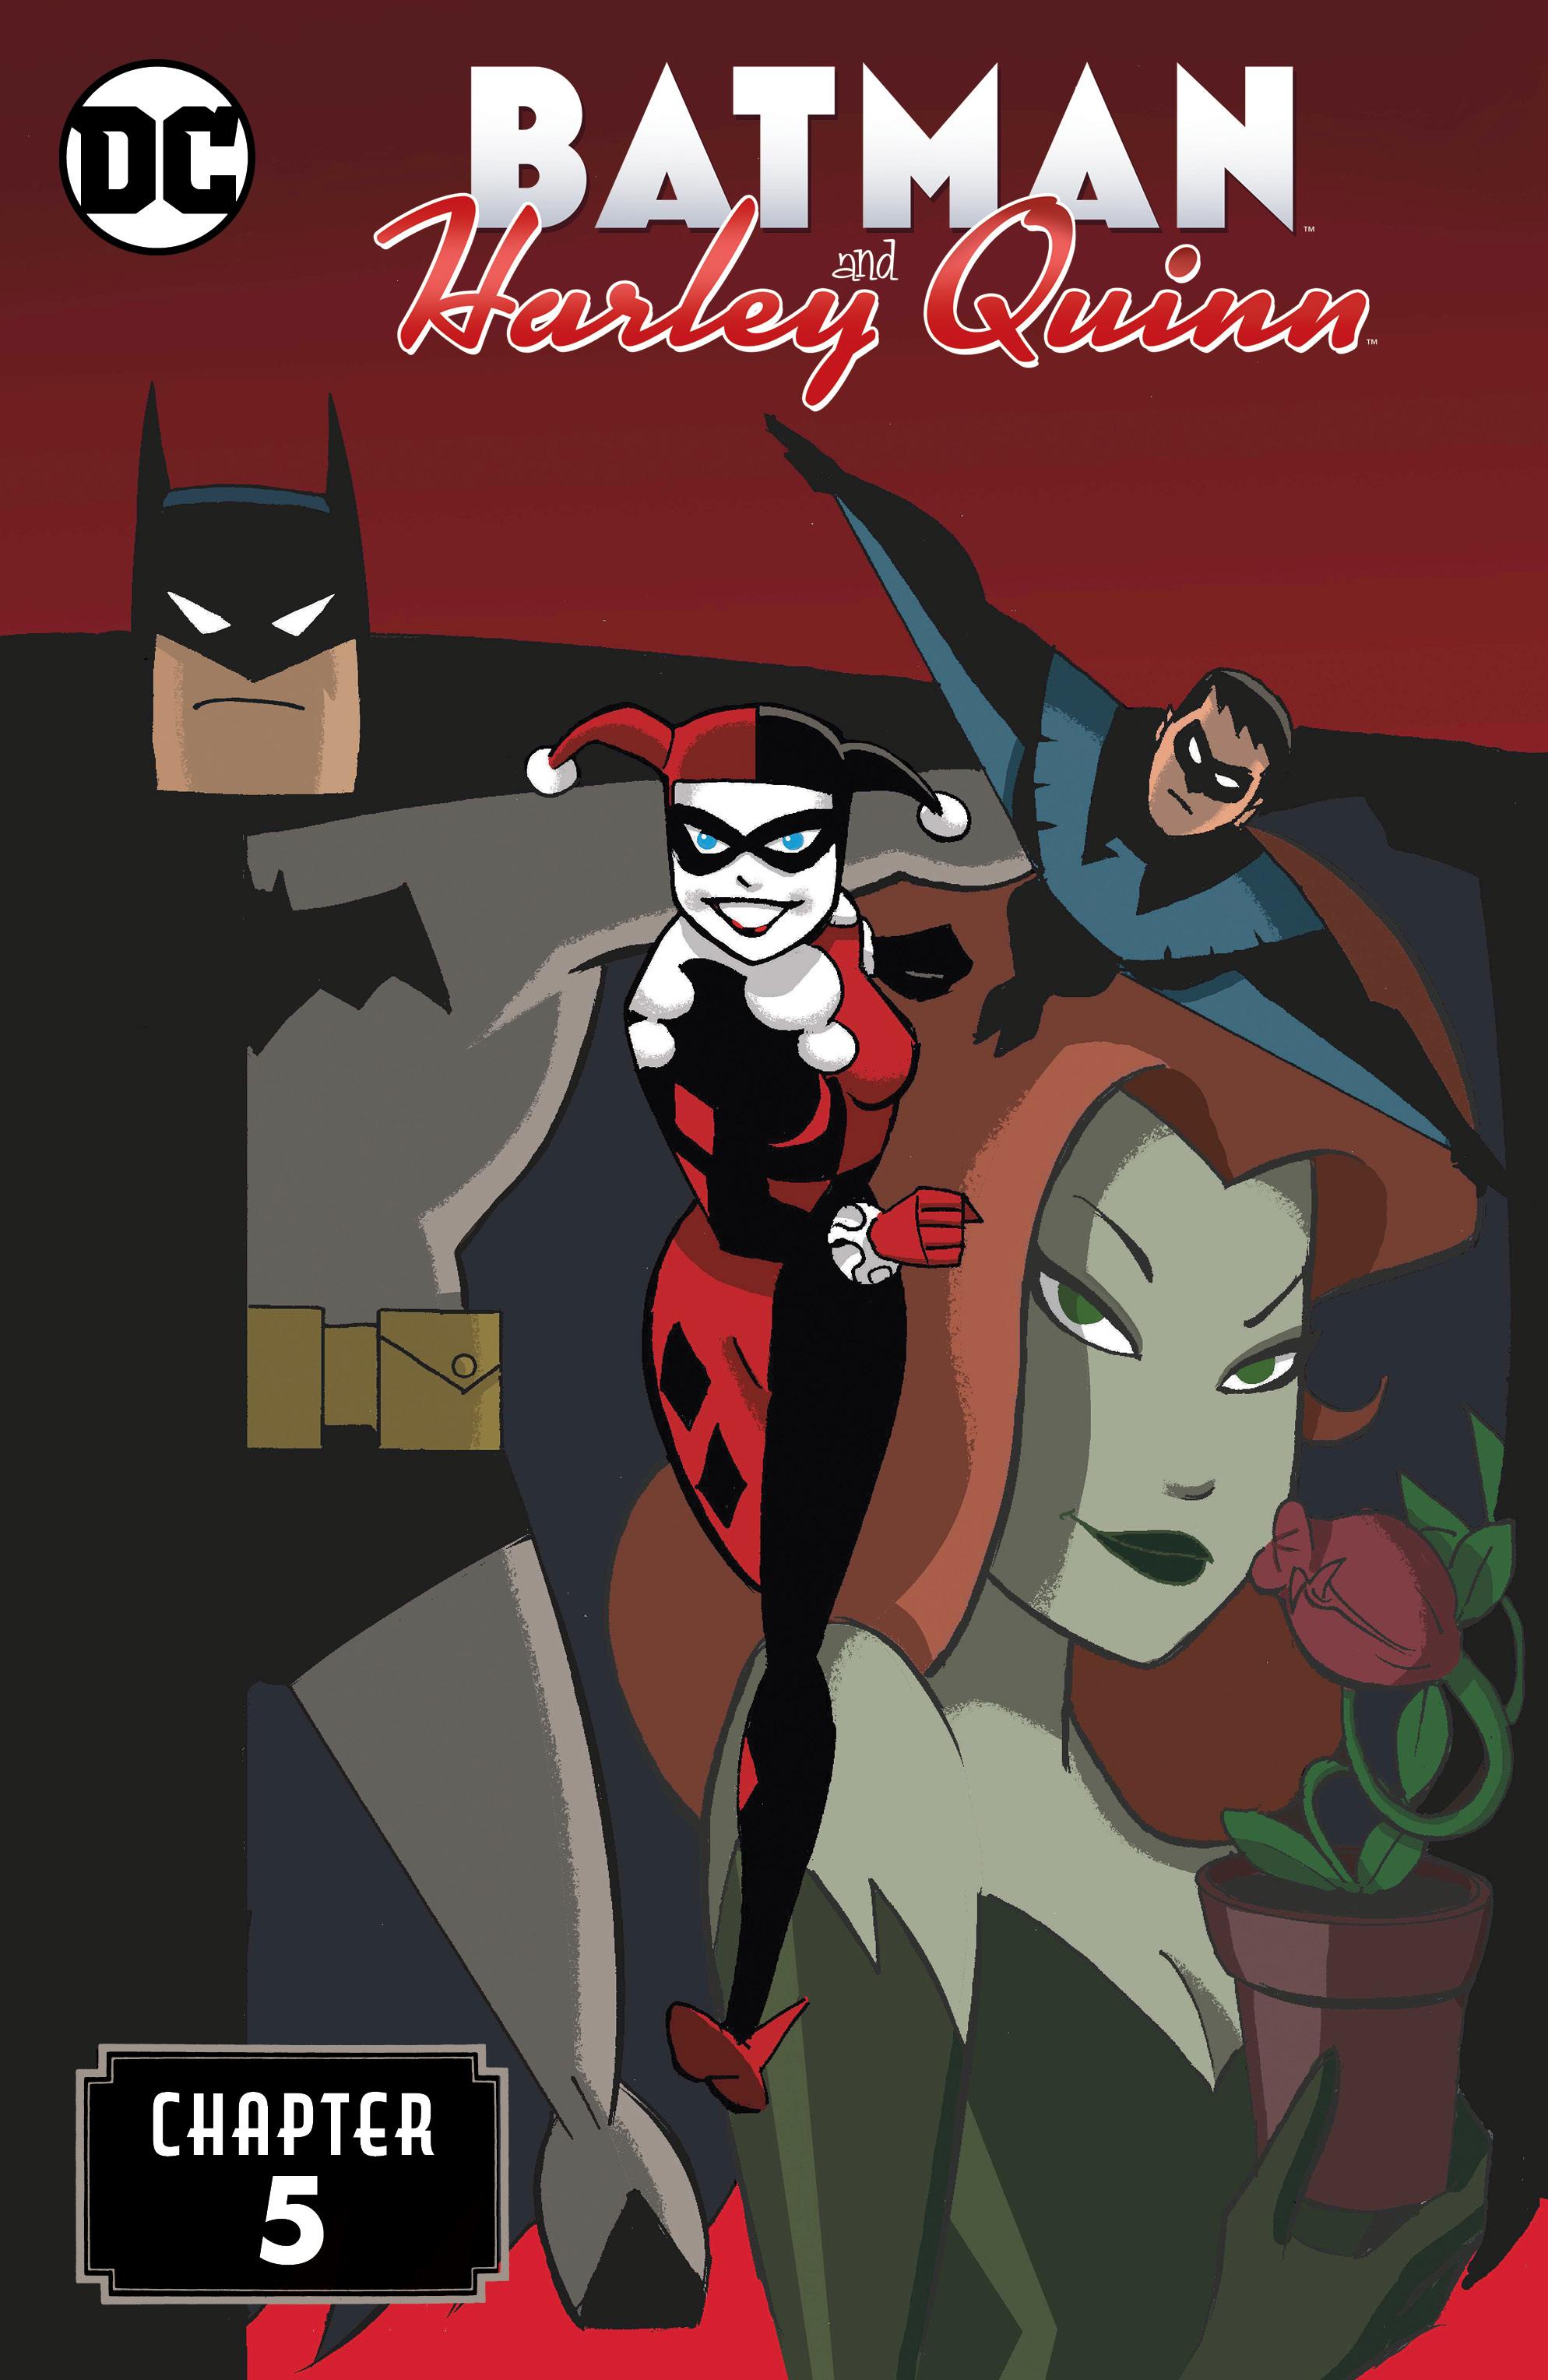 Batman and Harley Quinn Vol 1 5 (Digital)